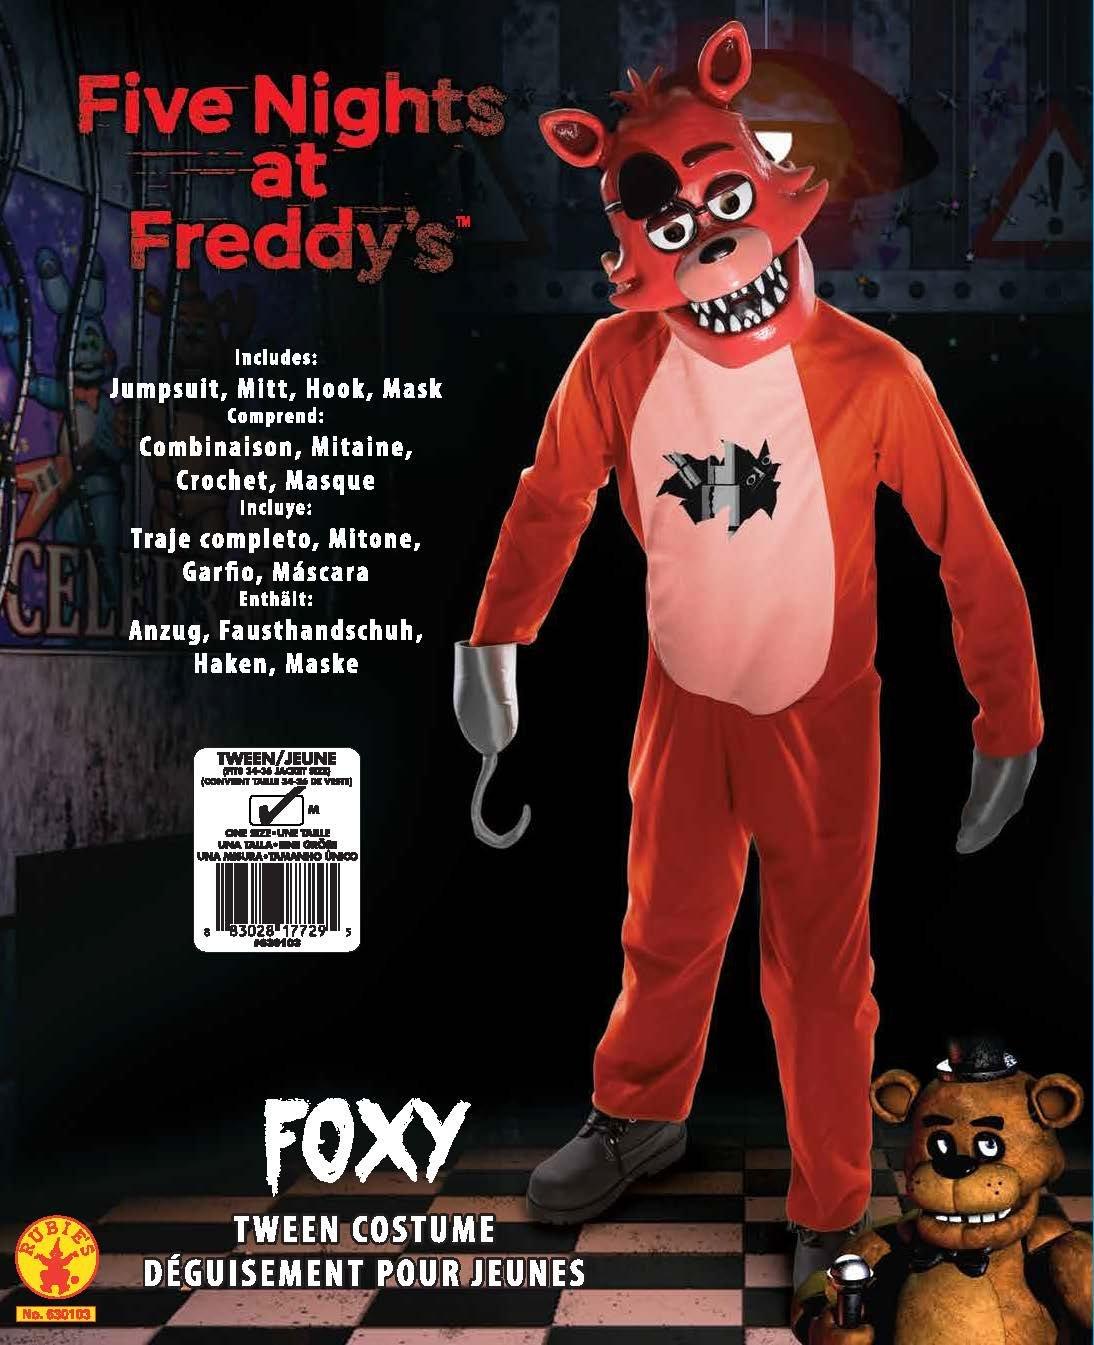 Five Nights at Freddy's Foxy Tween Costume